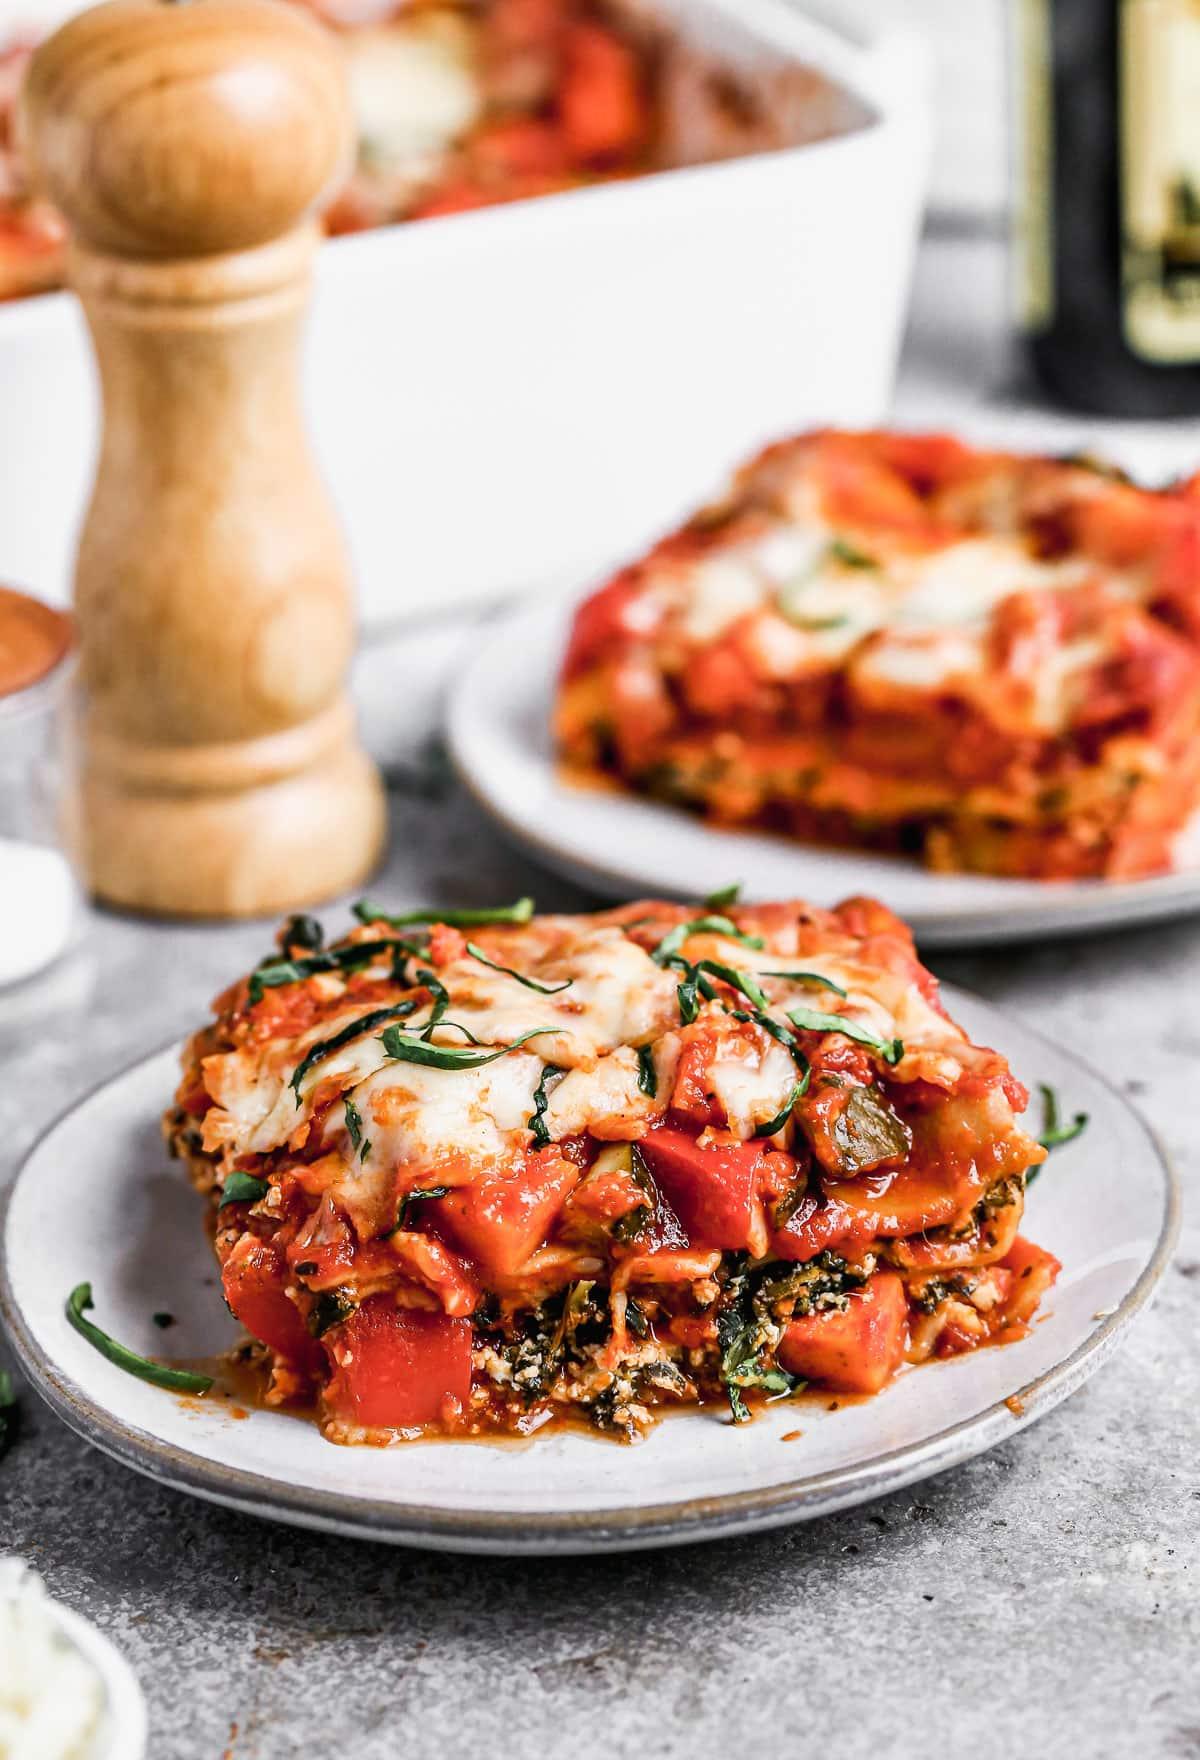 Vegetable lasagna on a plate